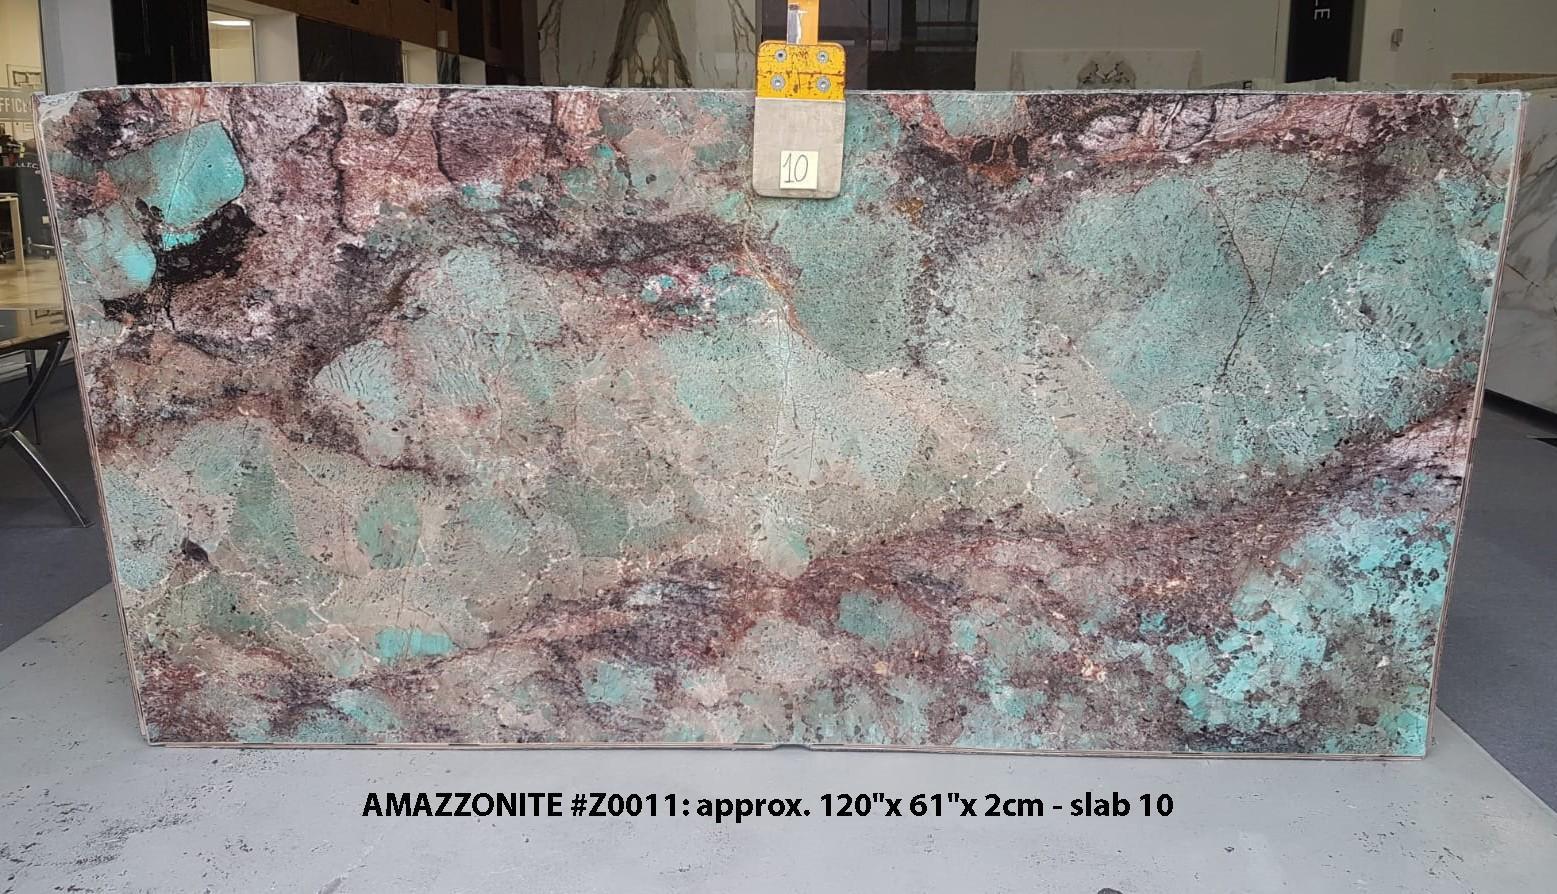 AMAZZONITE Fourniture Veneto (Italie) d' dalles brillantes en pierre semi précieuse naturelle Z0011 , Slab #10